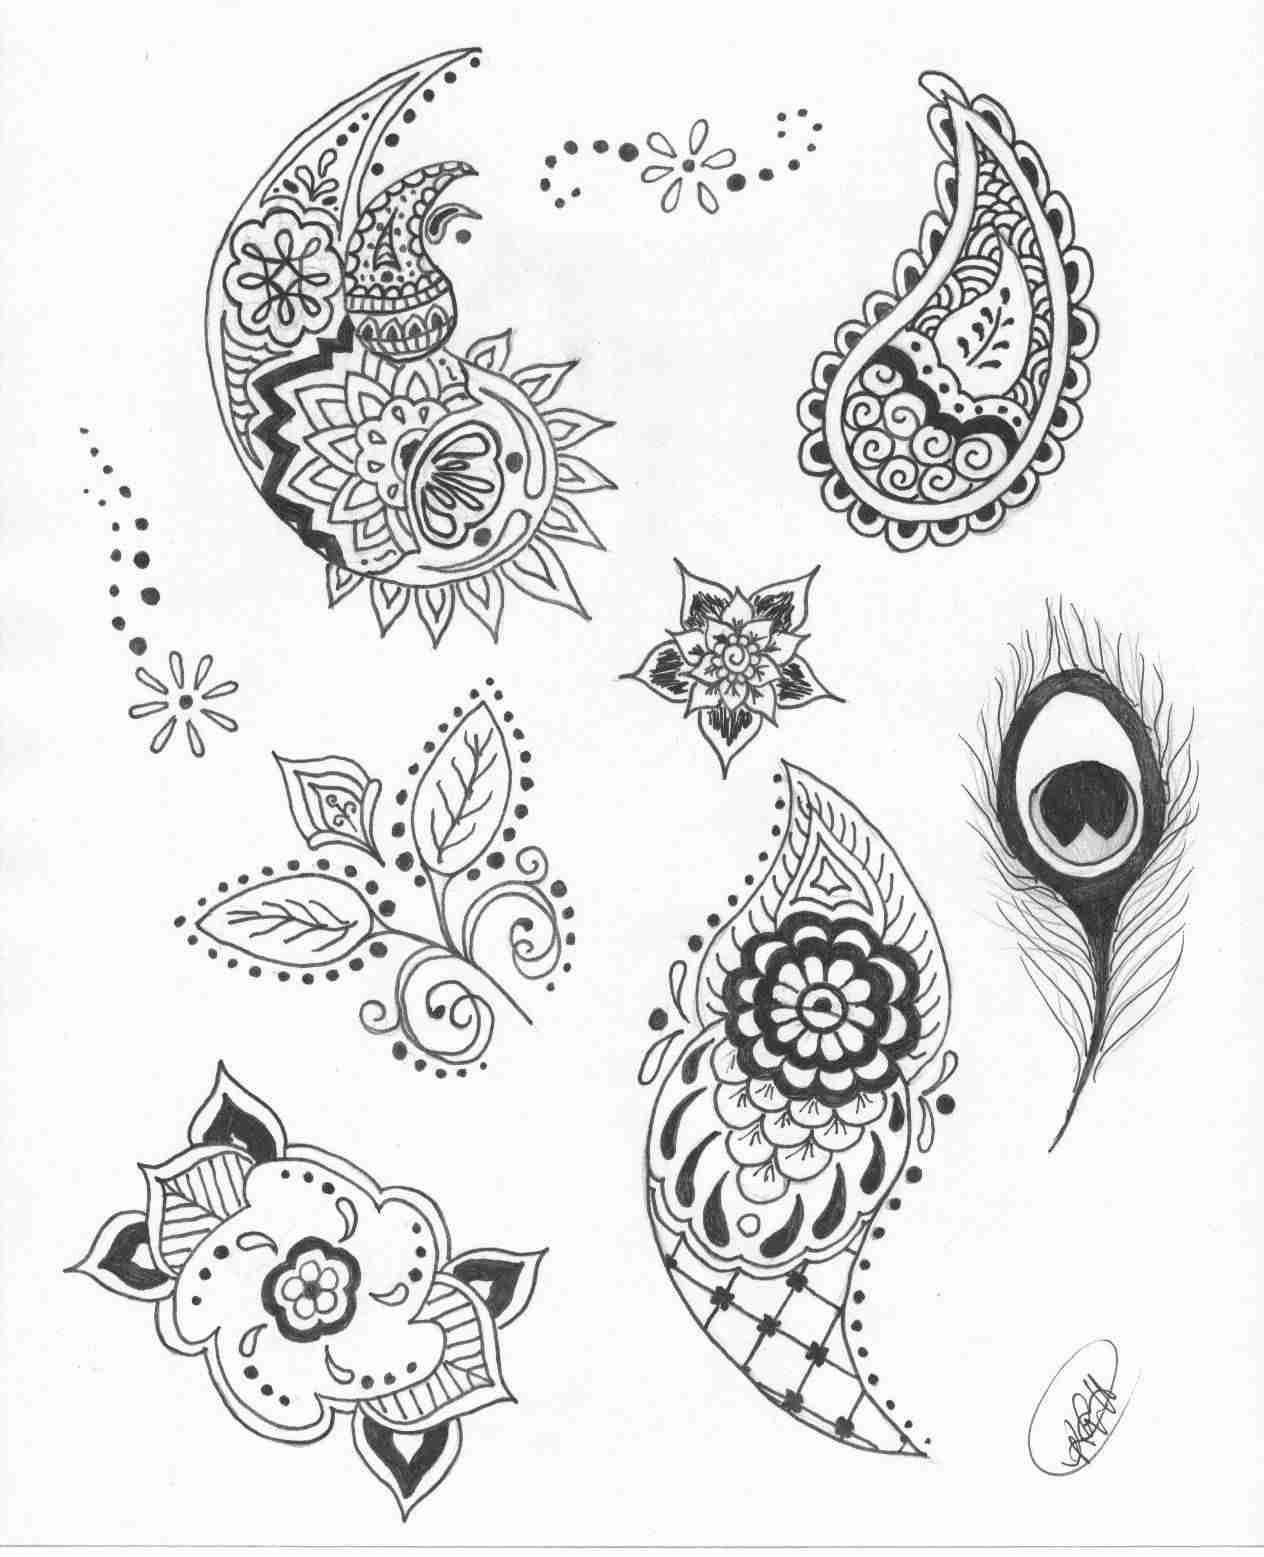 Pin By Sara Aibel On Mehndi Art Hd Wallpaper Gallery Henna Tattoo Designs Henna Designs Hand Henna Patterns